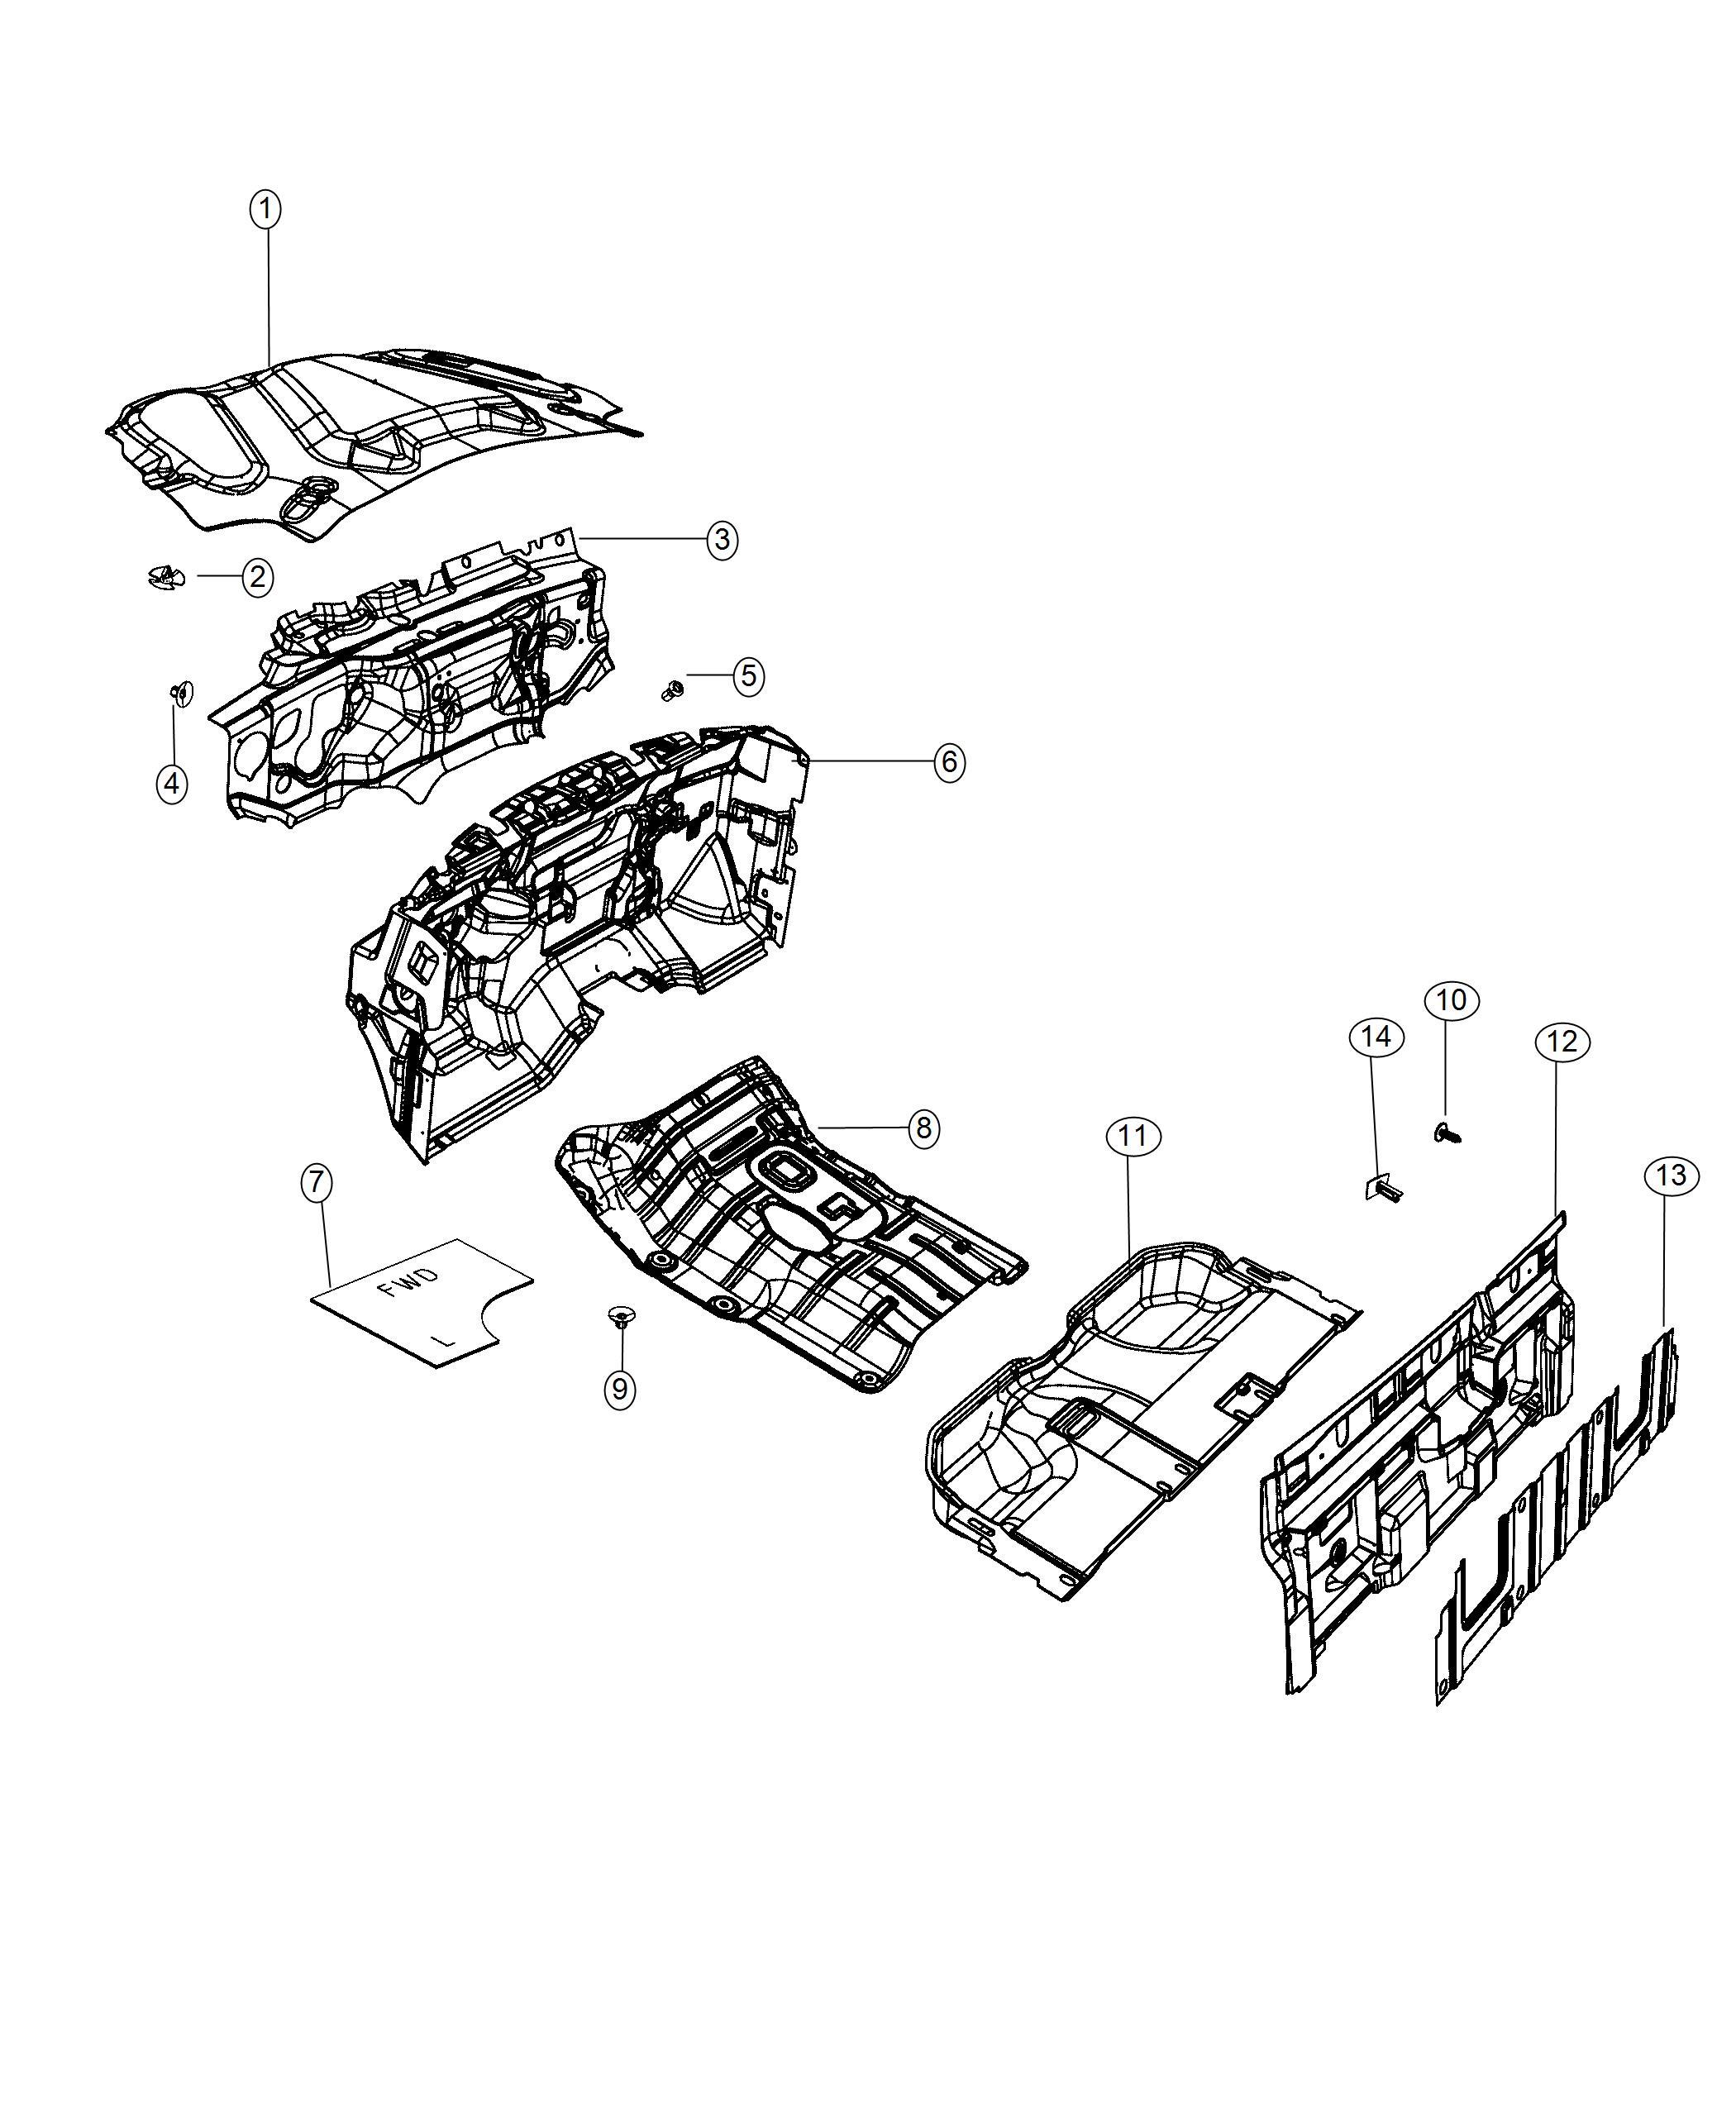 Ram Laramie Insulation Dash Panel 3 0l V6 Turbosel